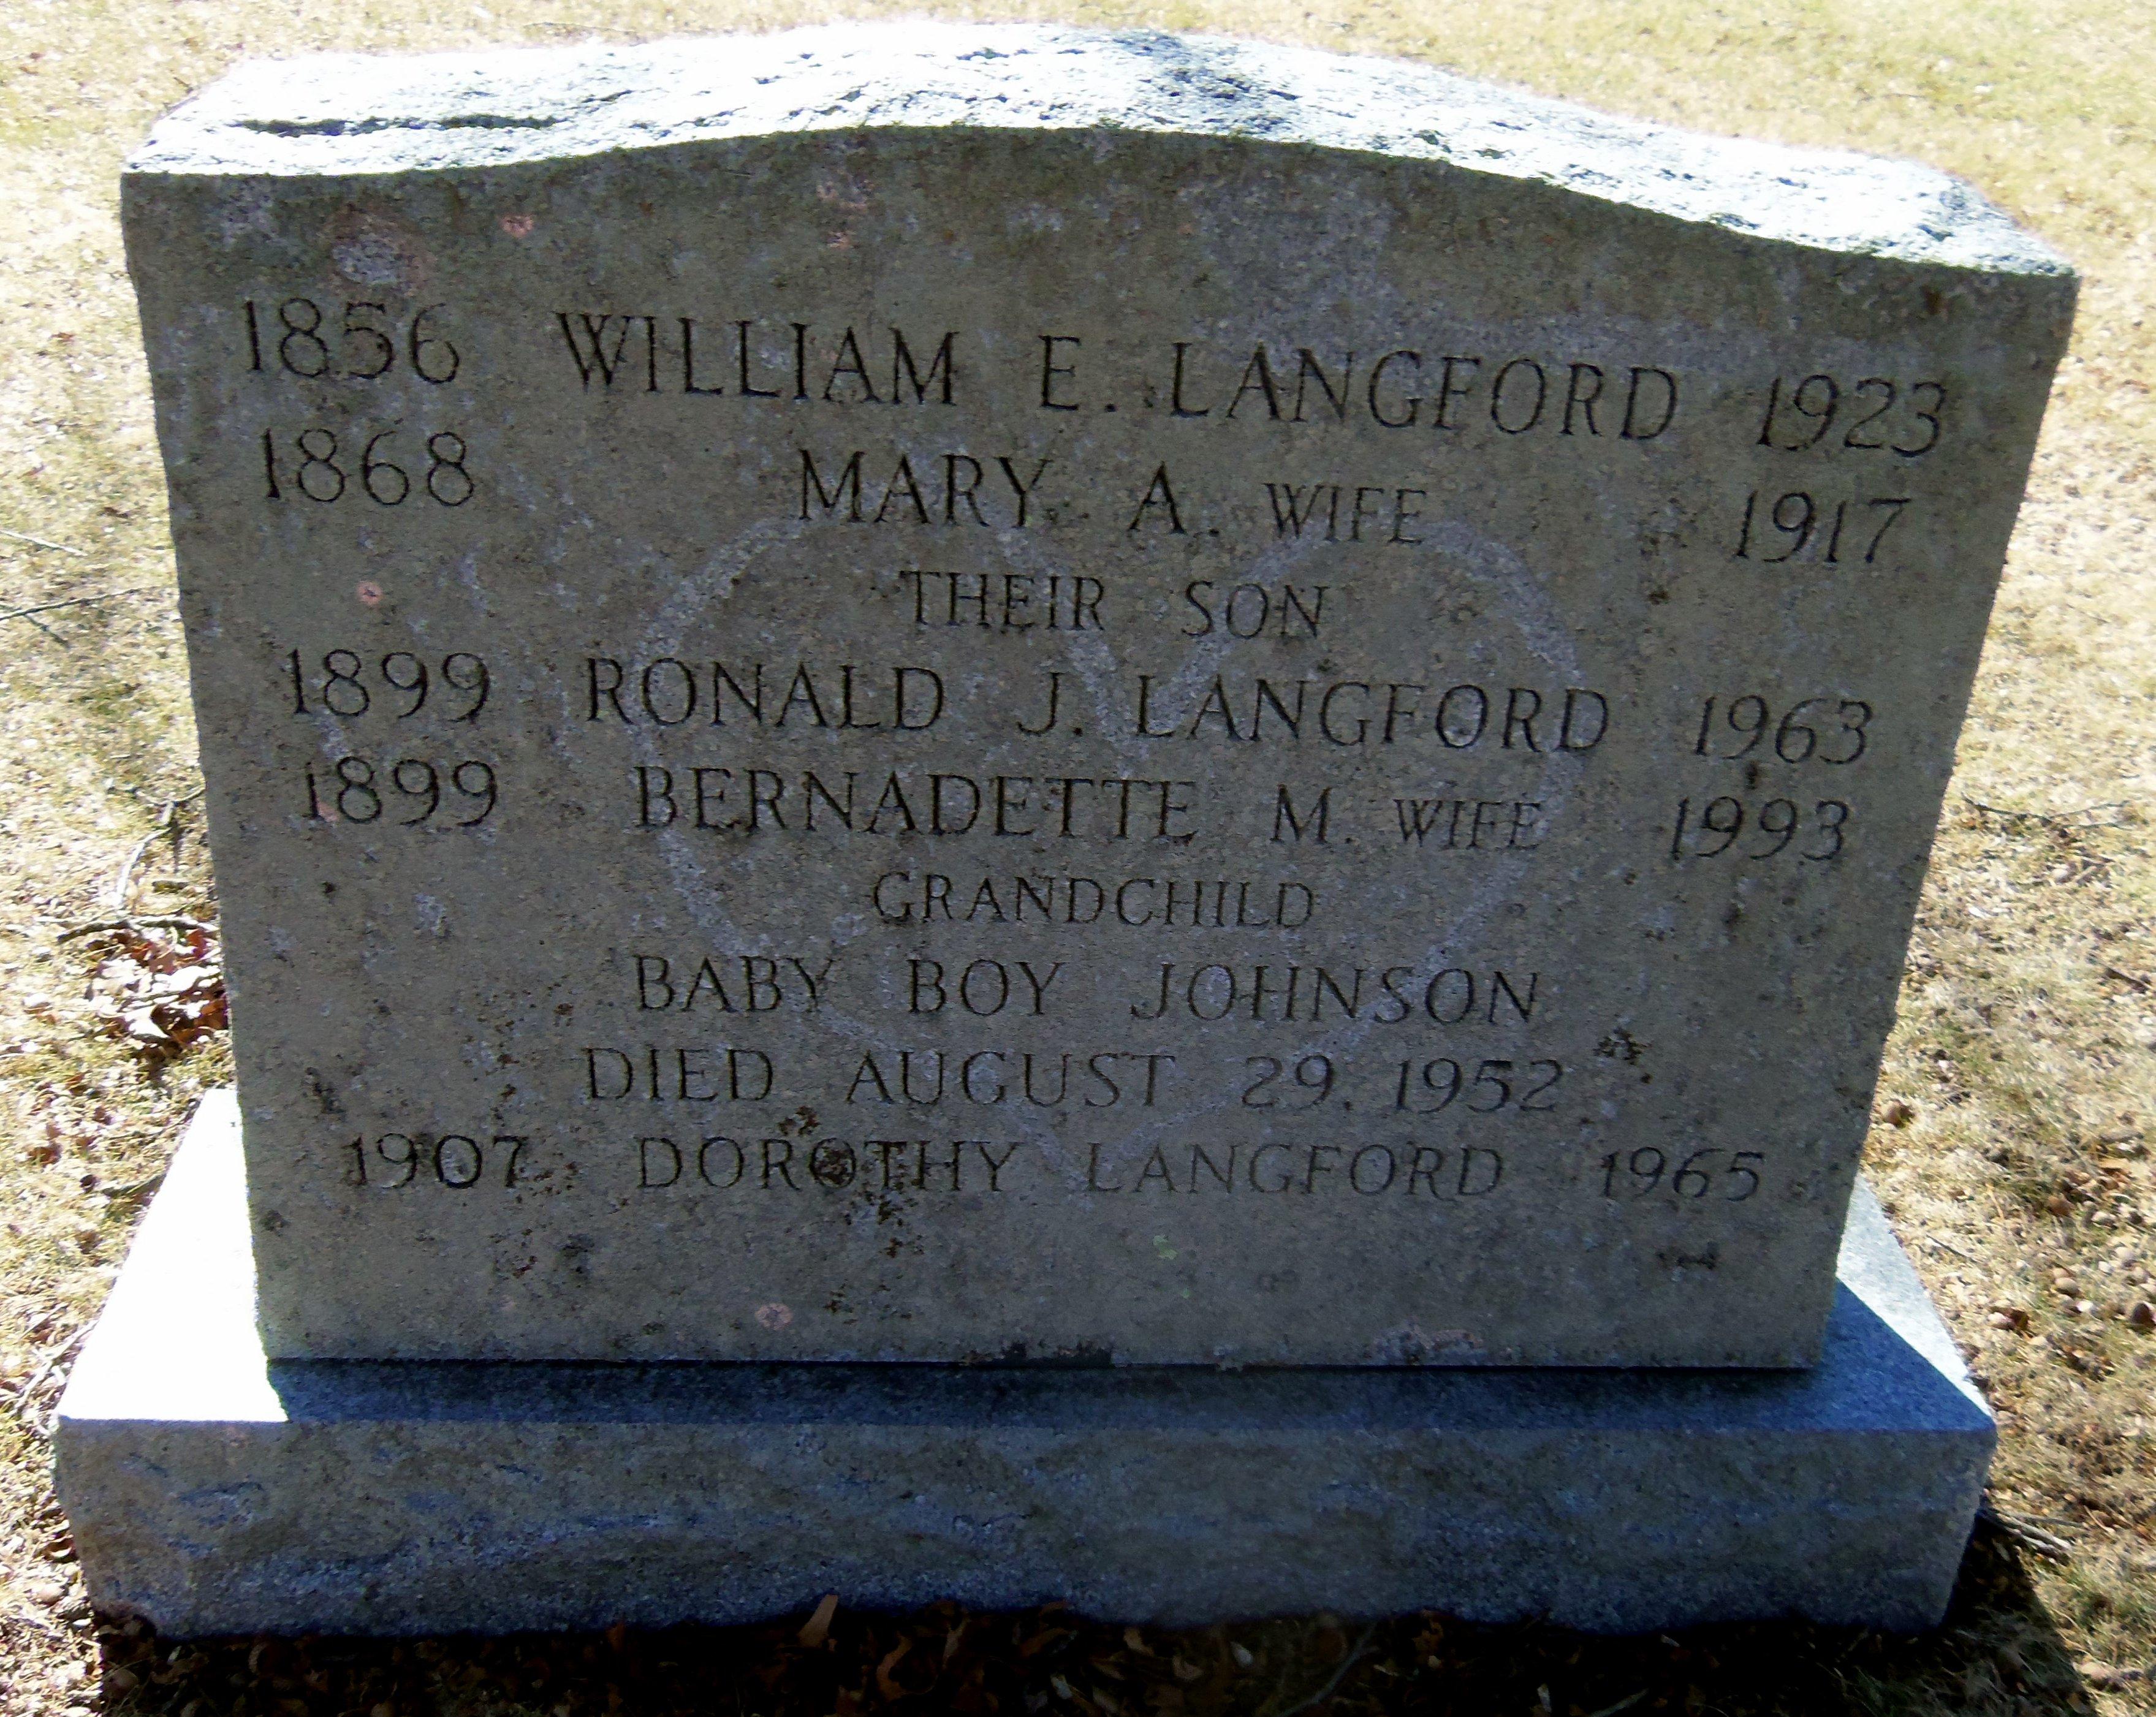 Ronald J. Langford, Sr